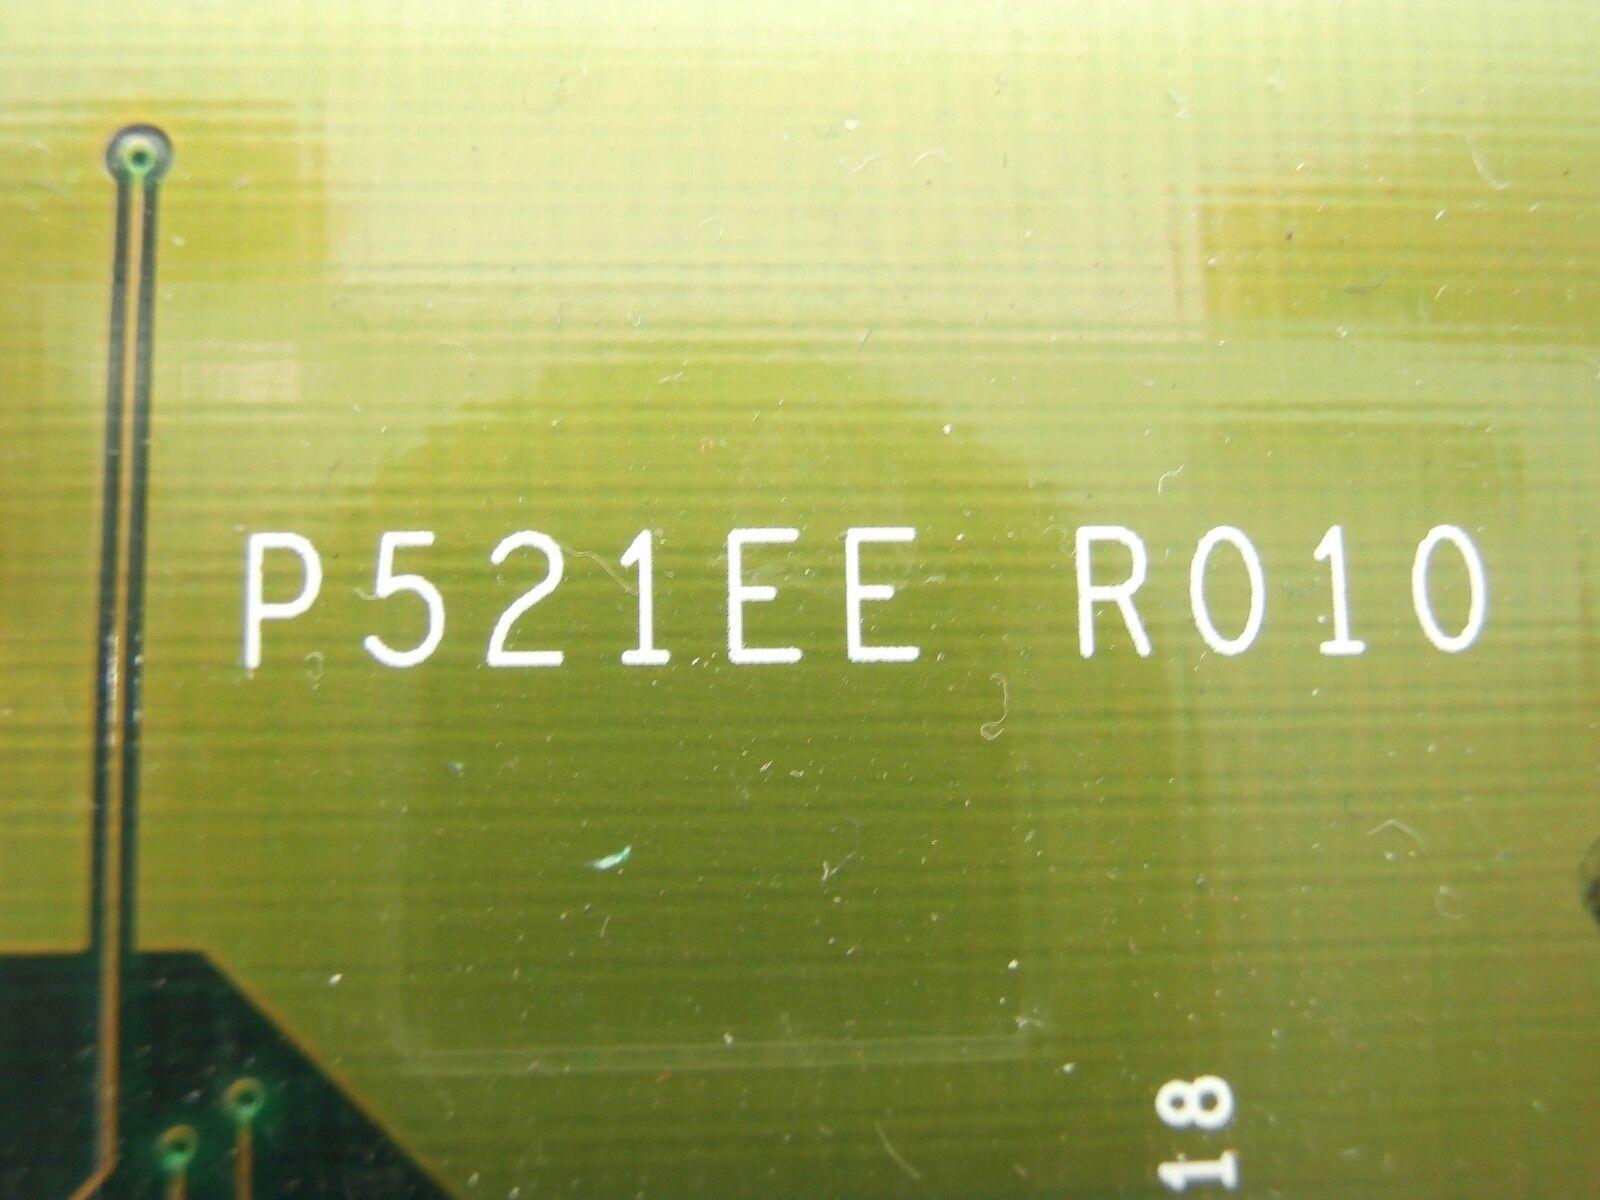 Tel Tokyo Electron P521EE R010 tarjeta de plano posterior PCB PCB PCB E82152 ACT8 Usado Funcionando a09a79